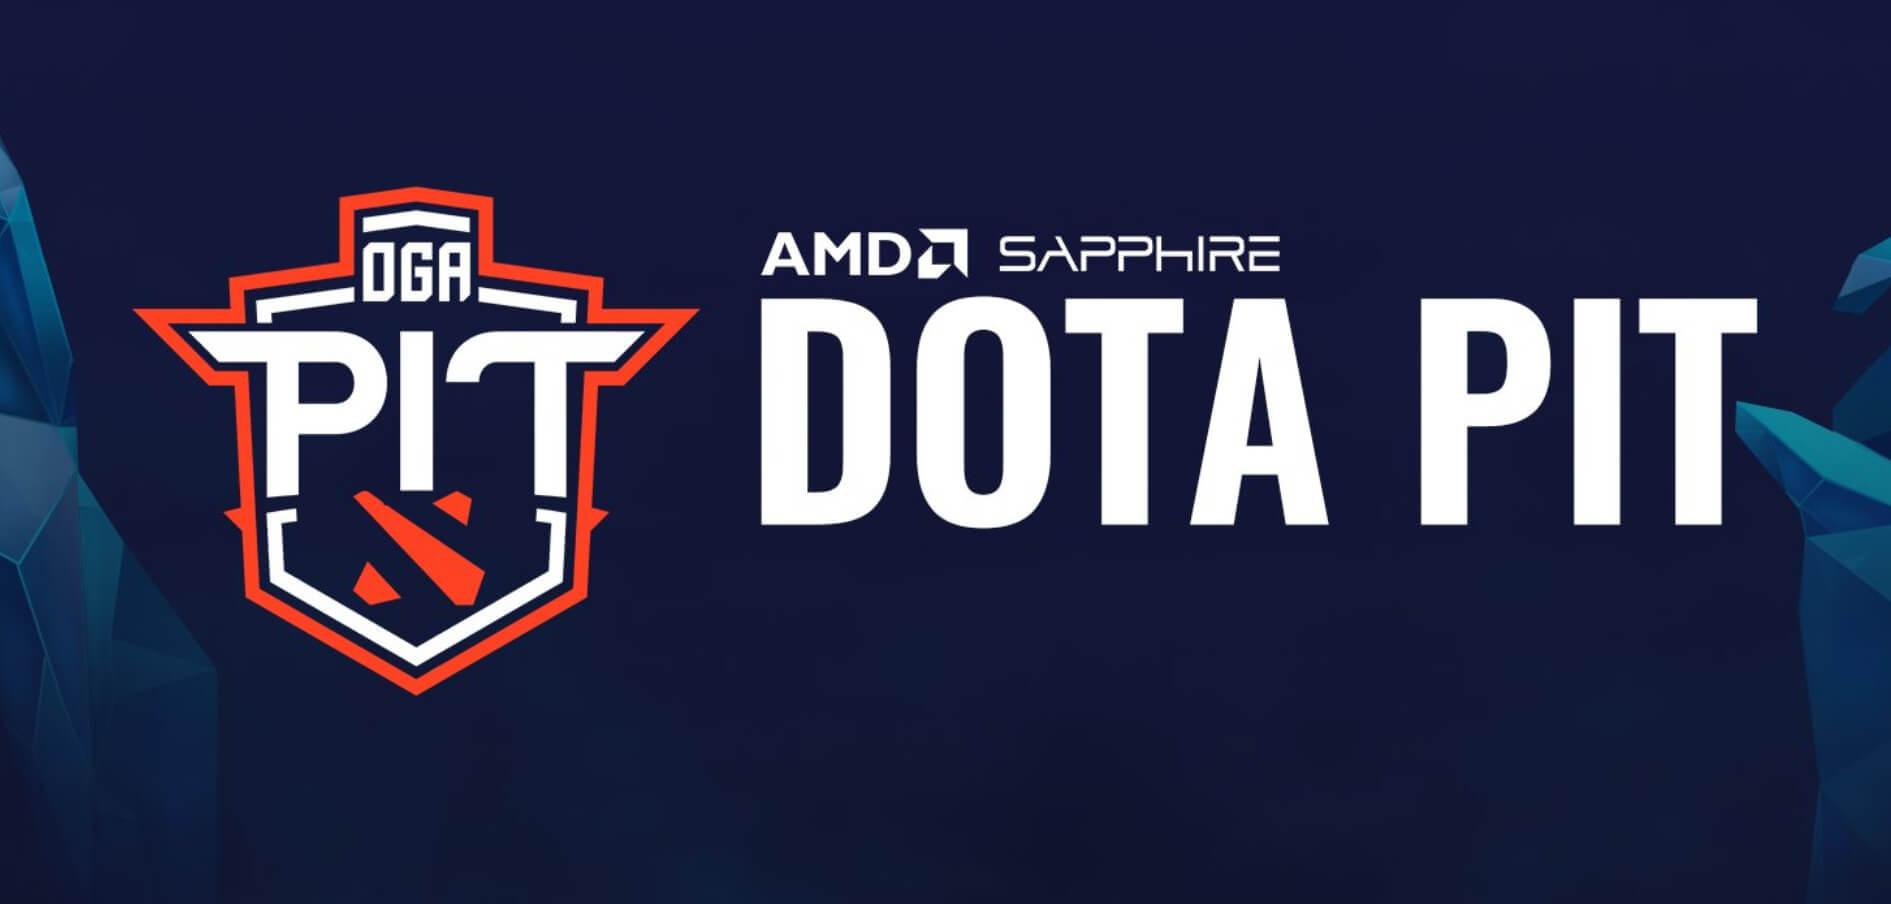 Dota Pit detalla el formato de la liga e invitaciones directas para la liga regional del Dota Pro Circuit de Sudamérica